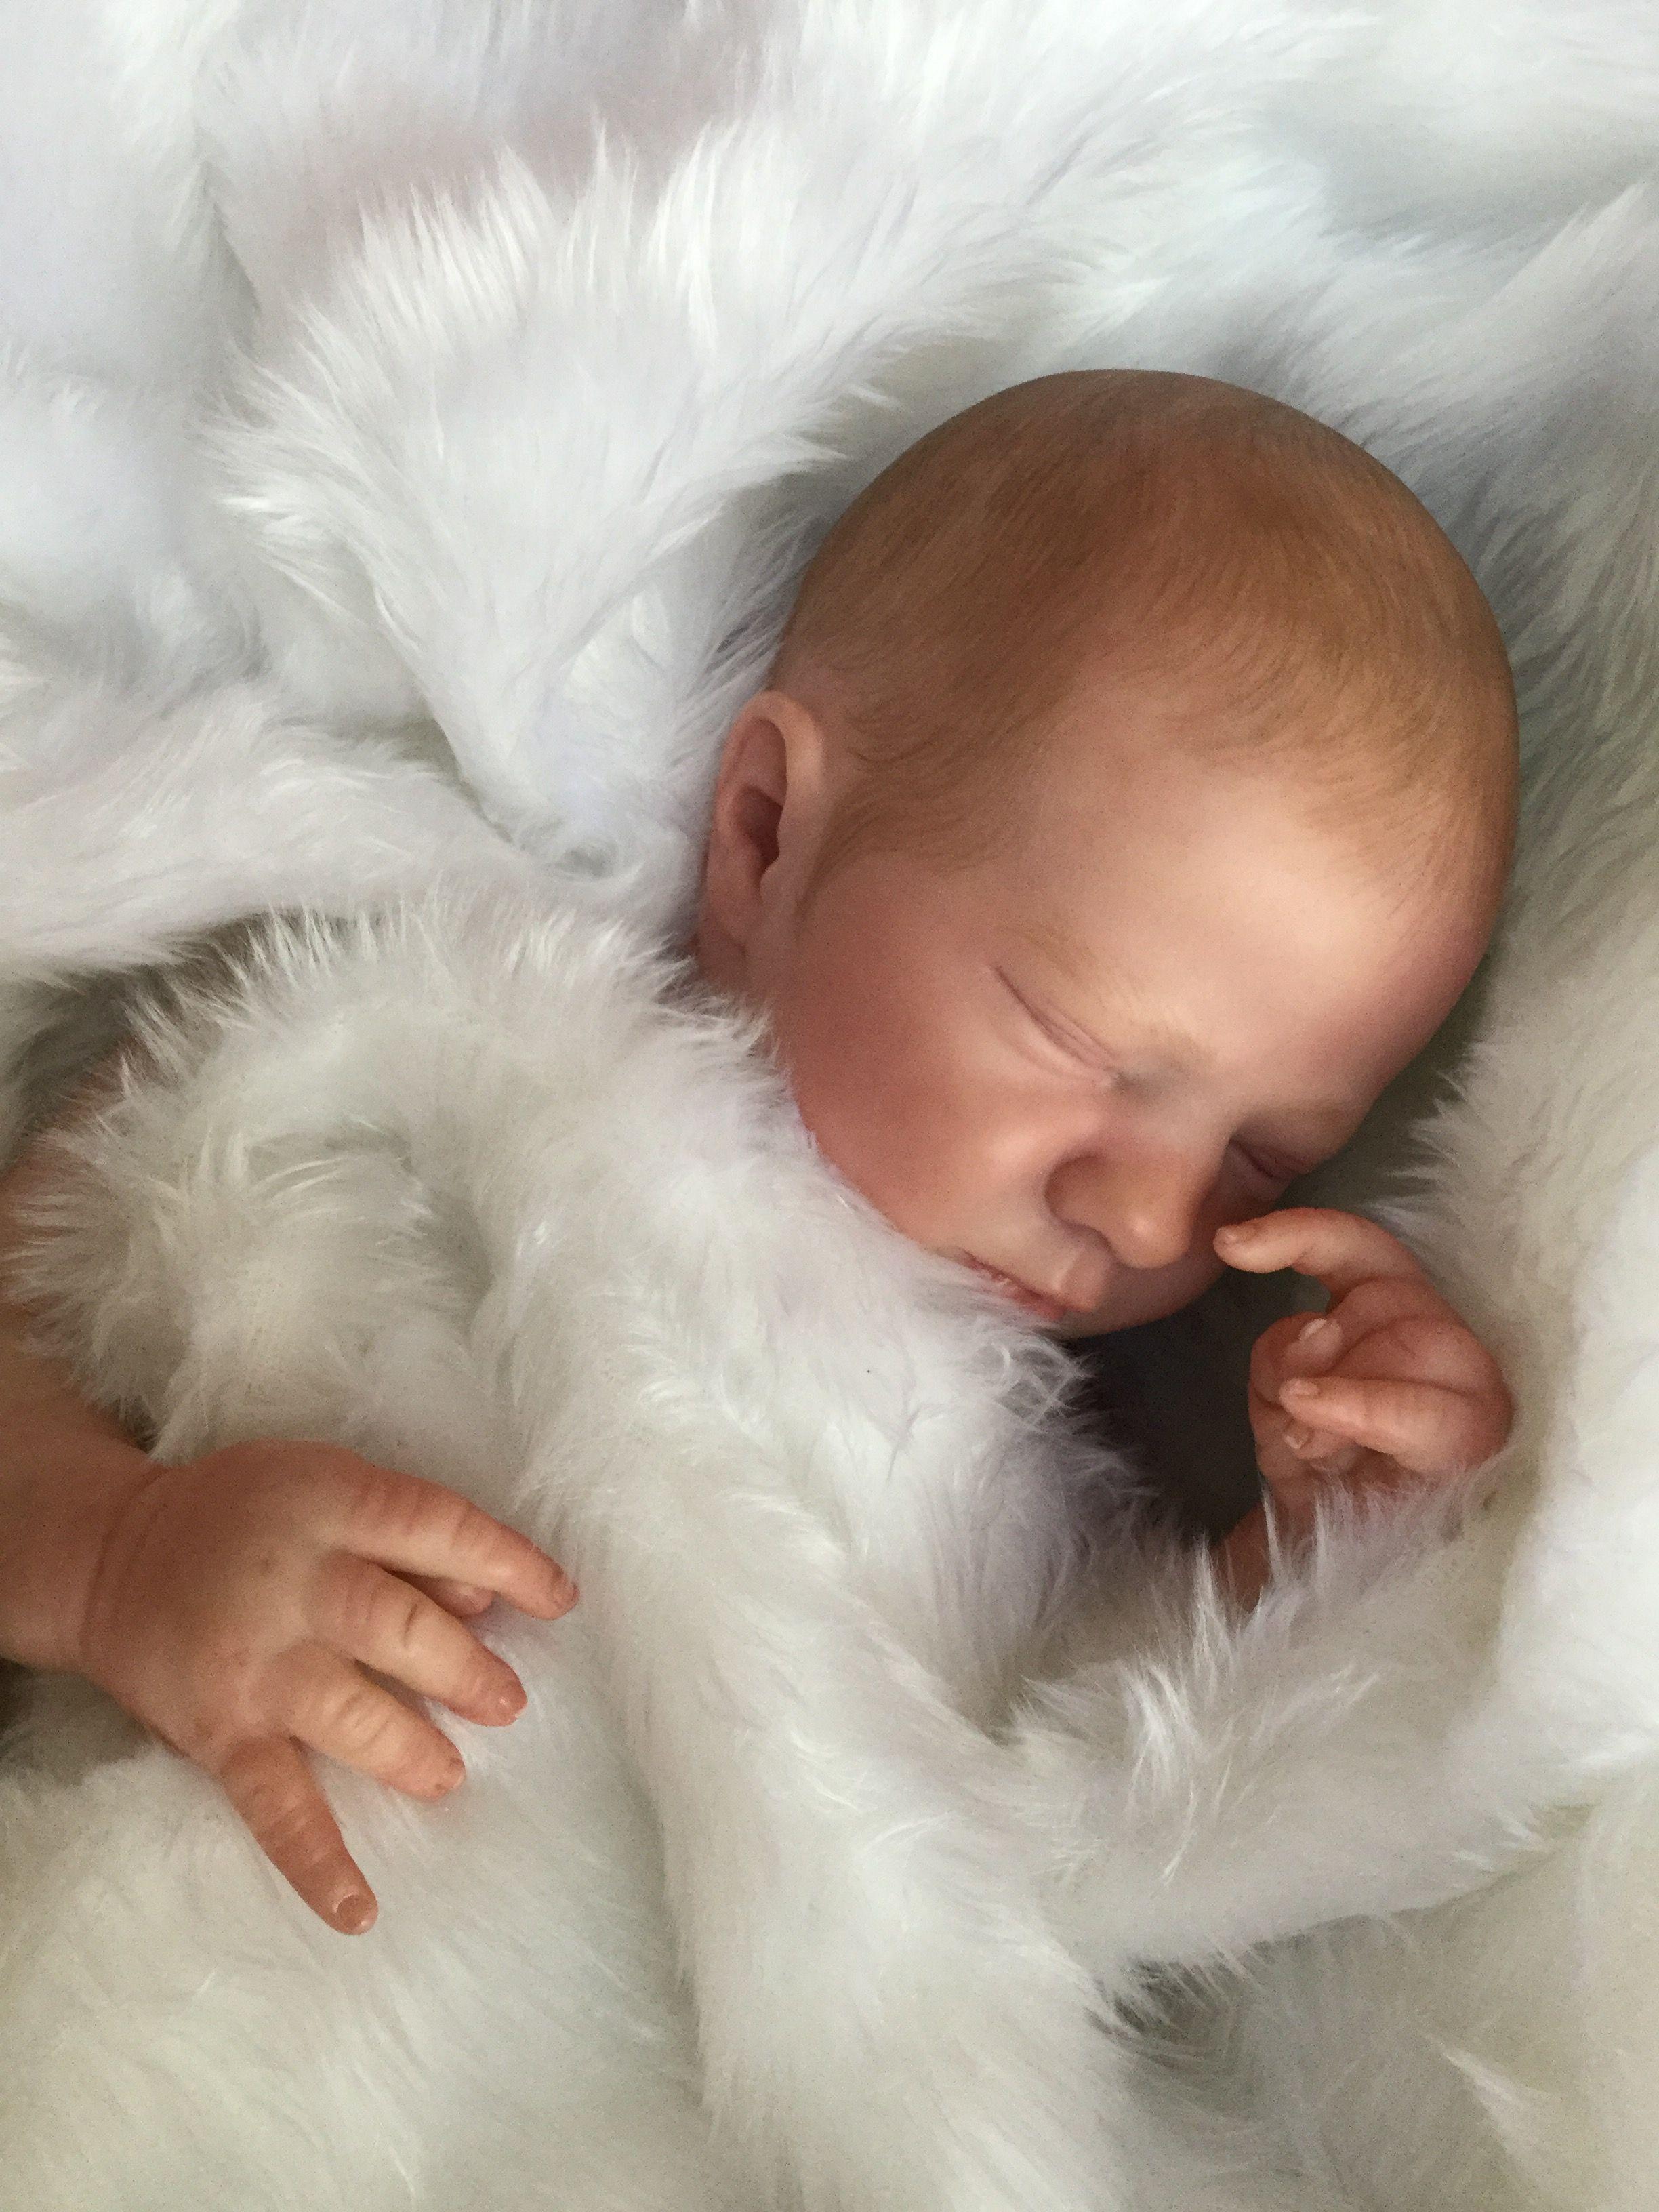 Baby bedtime youtube - Up For Adoption 250 Mysweetcupcake On Youtube My Sweet Cupcake Nursery On Facebook